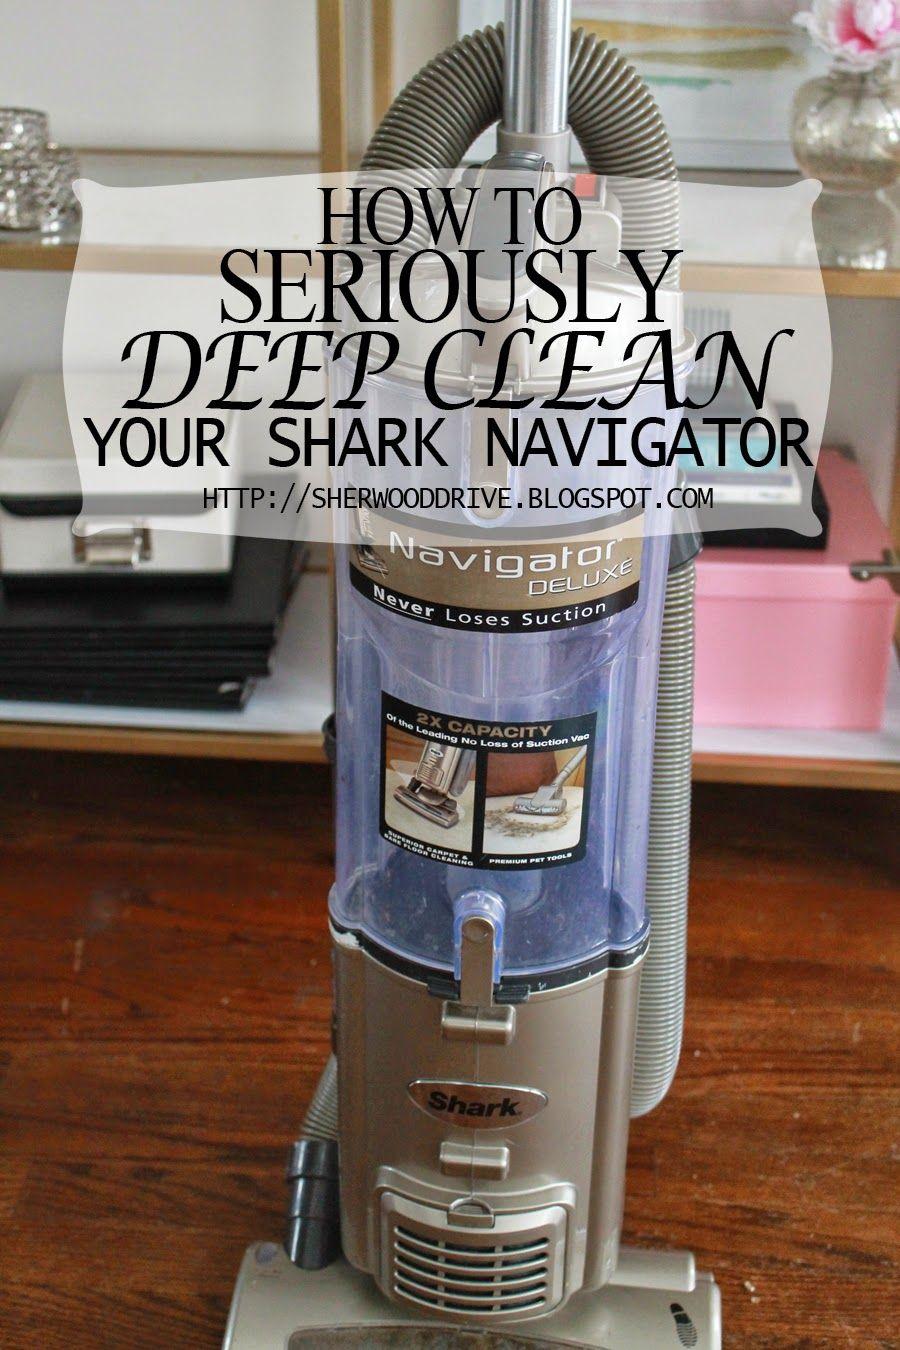 How to deep clean your shark navigator shark navigator